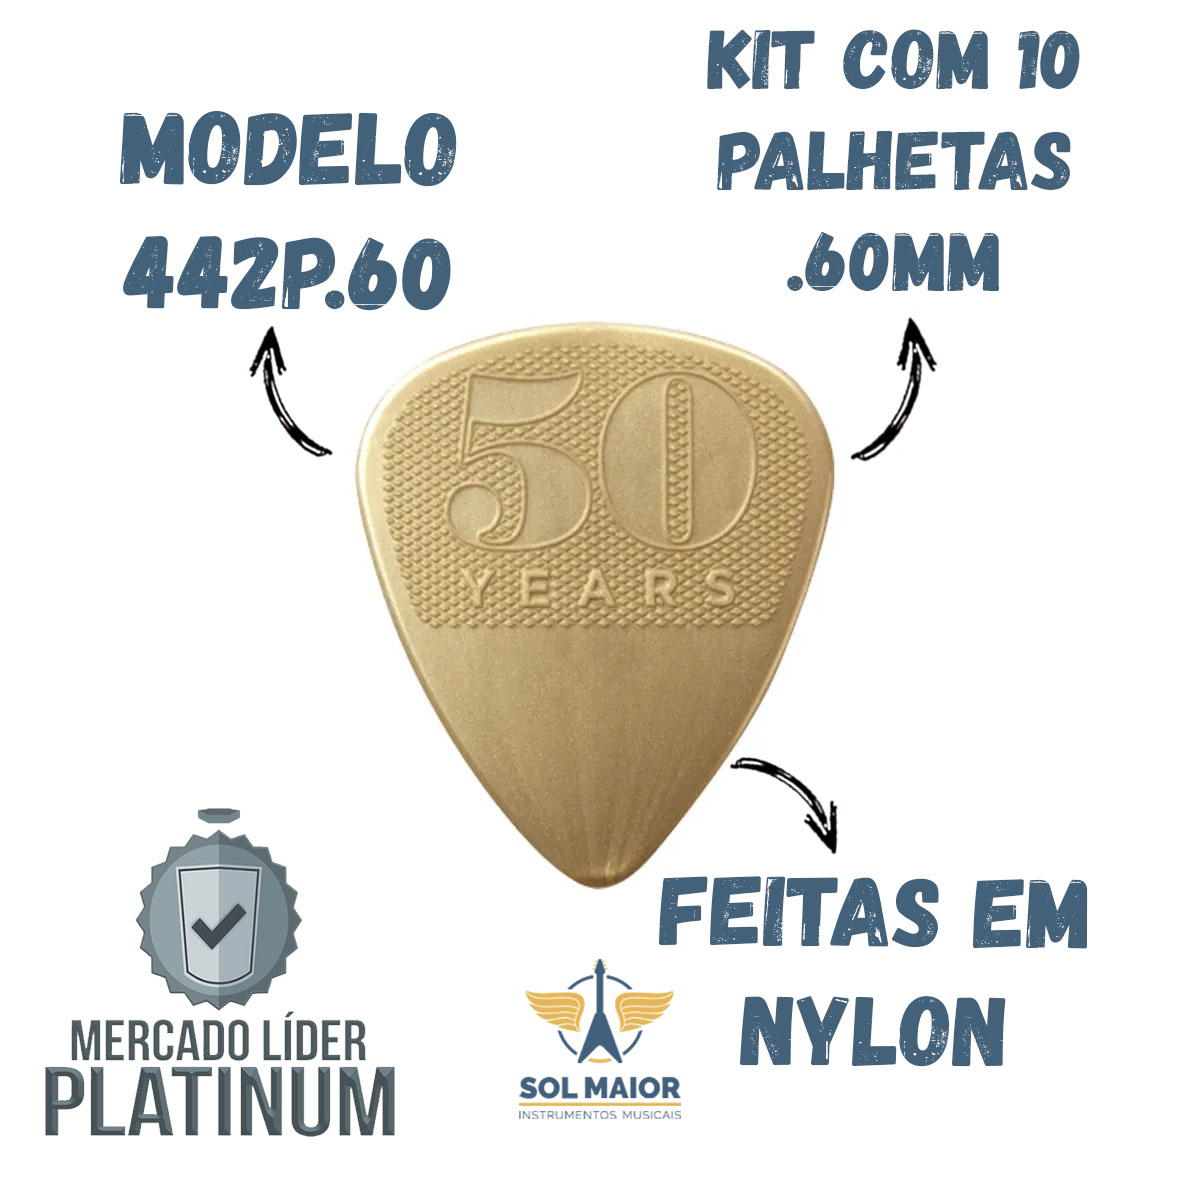 Kit com 10 Palhetas Nylon 0,60mm 50th YEARS 442P.60